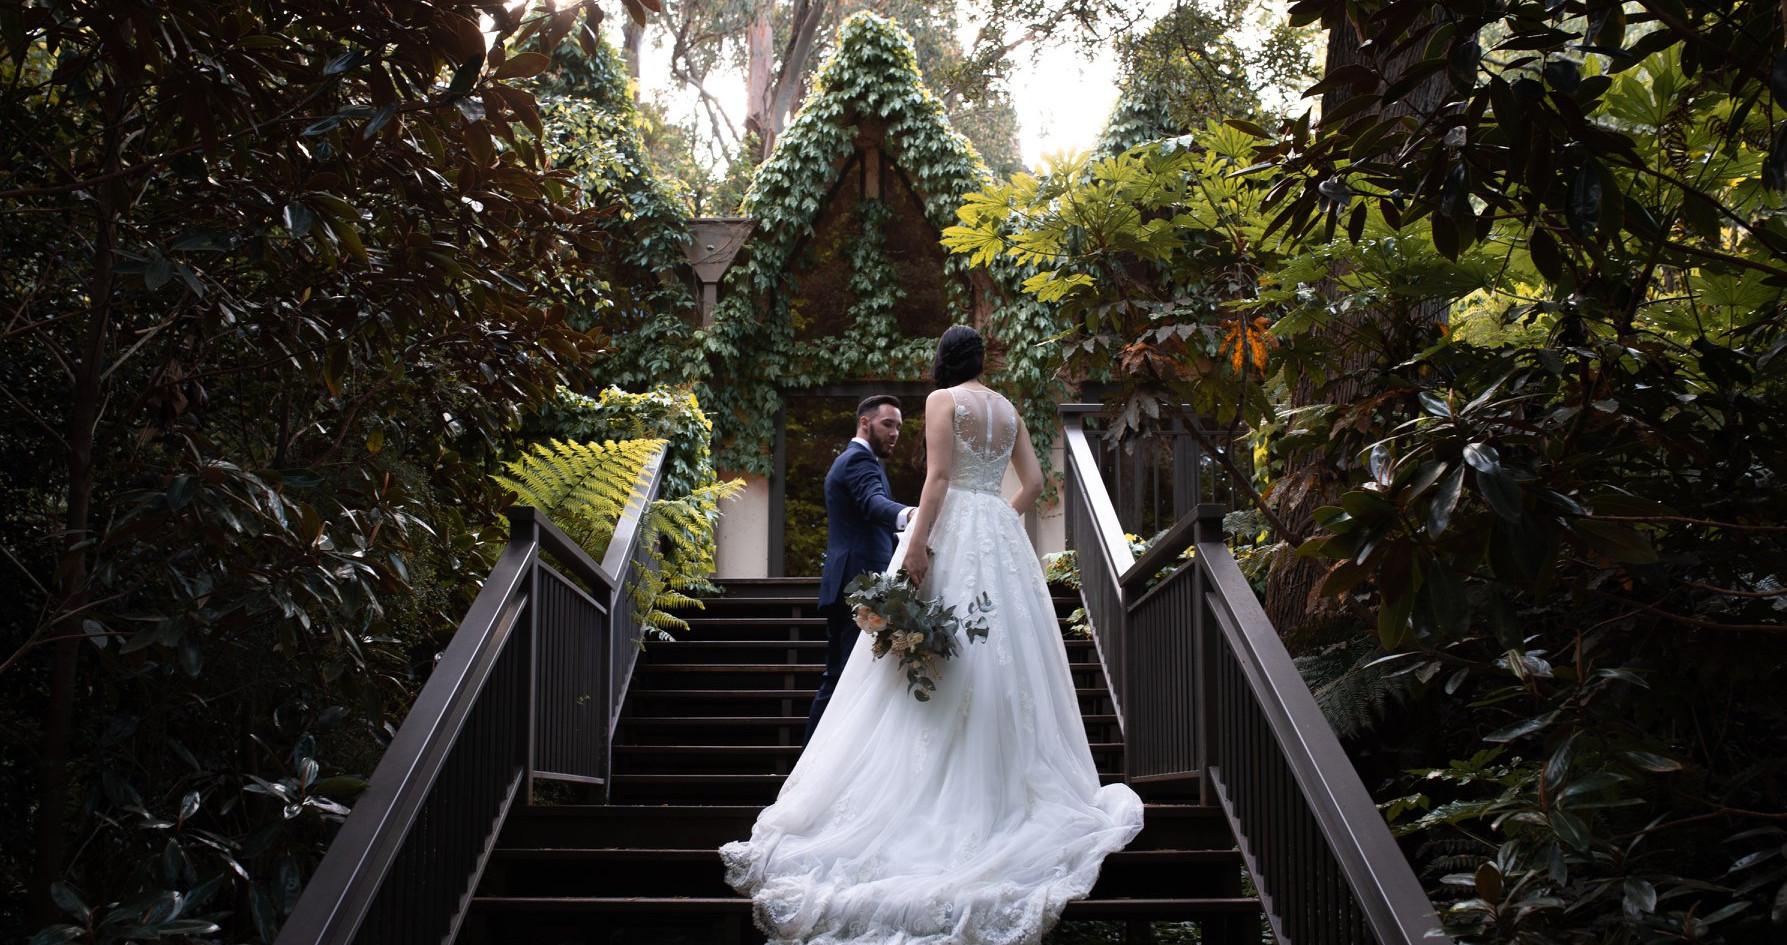 Chris & Nicole | WEDDING FILM